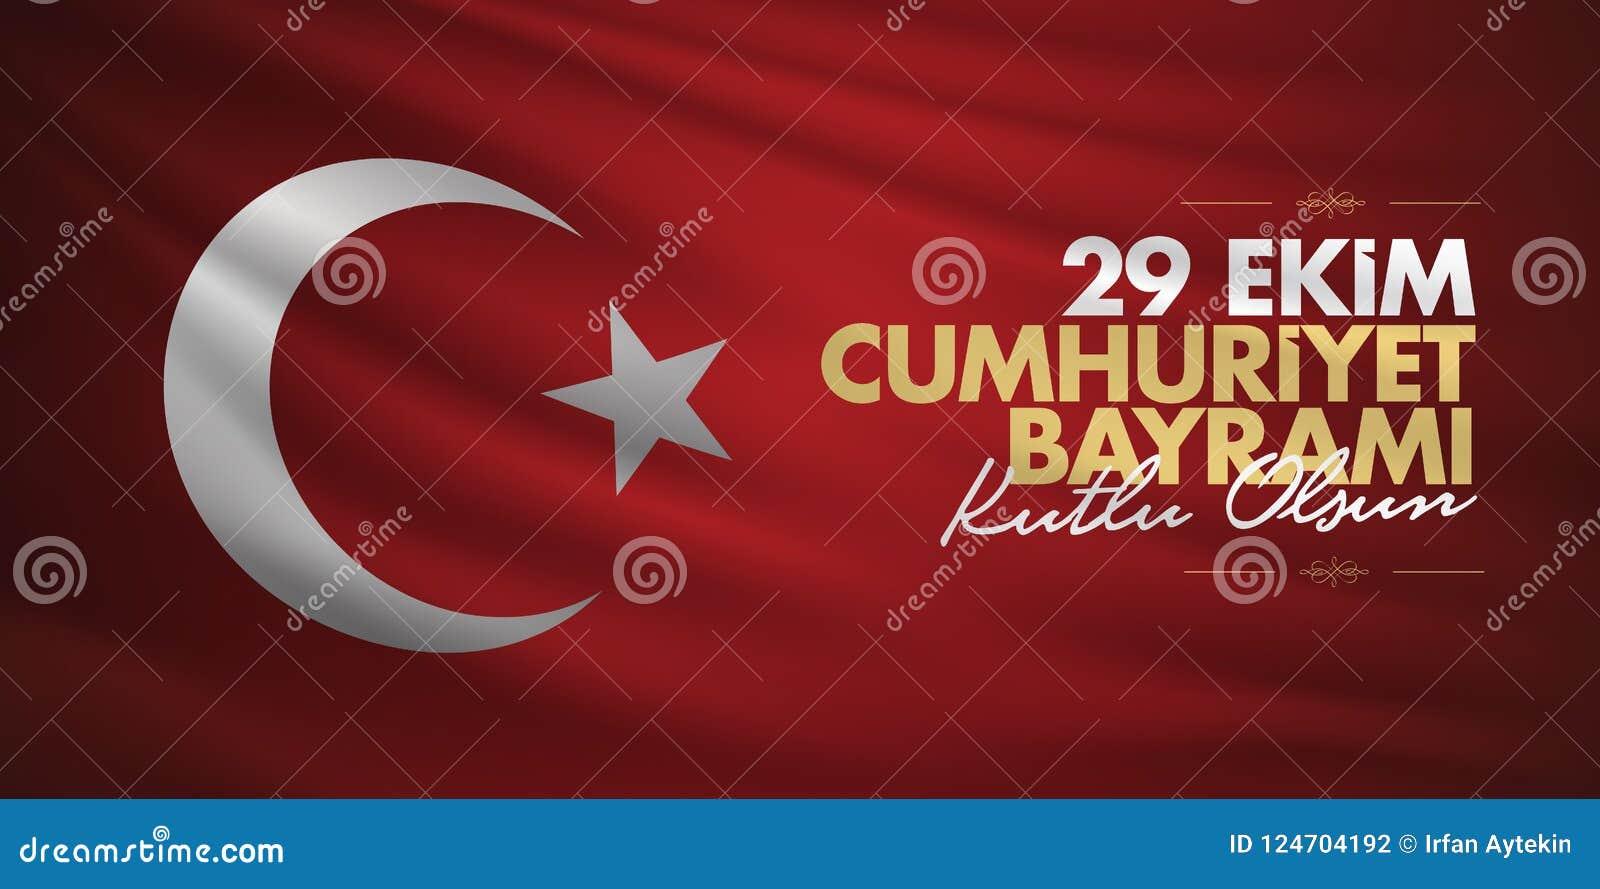 29 ekim Cumhuriyet Bayrami. Translation: 29 october Republic Day Turkey and the National Day in Turkey, billboard wishes design.